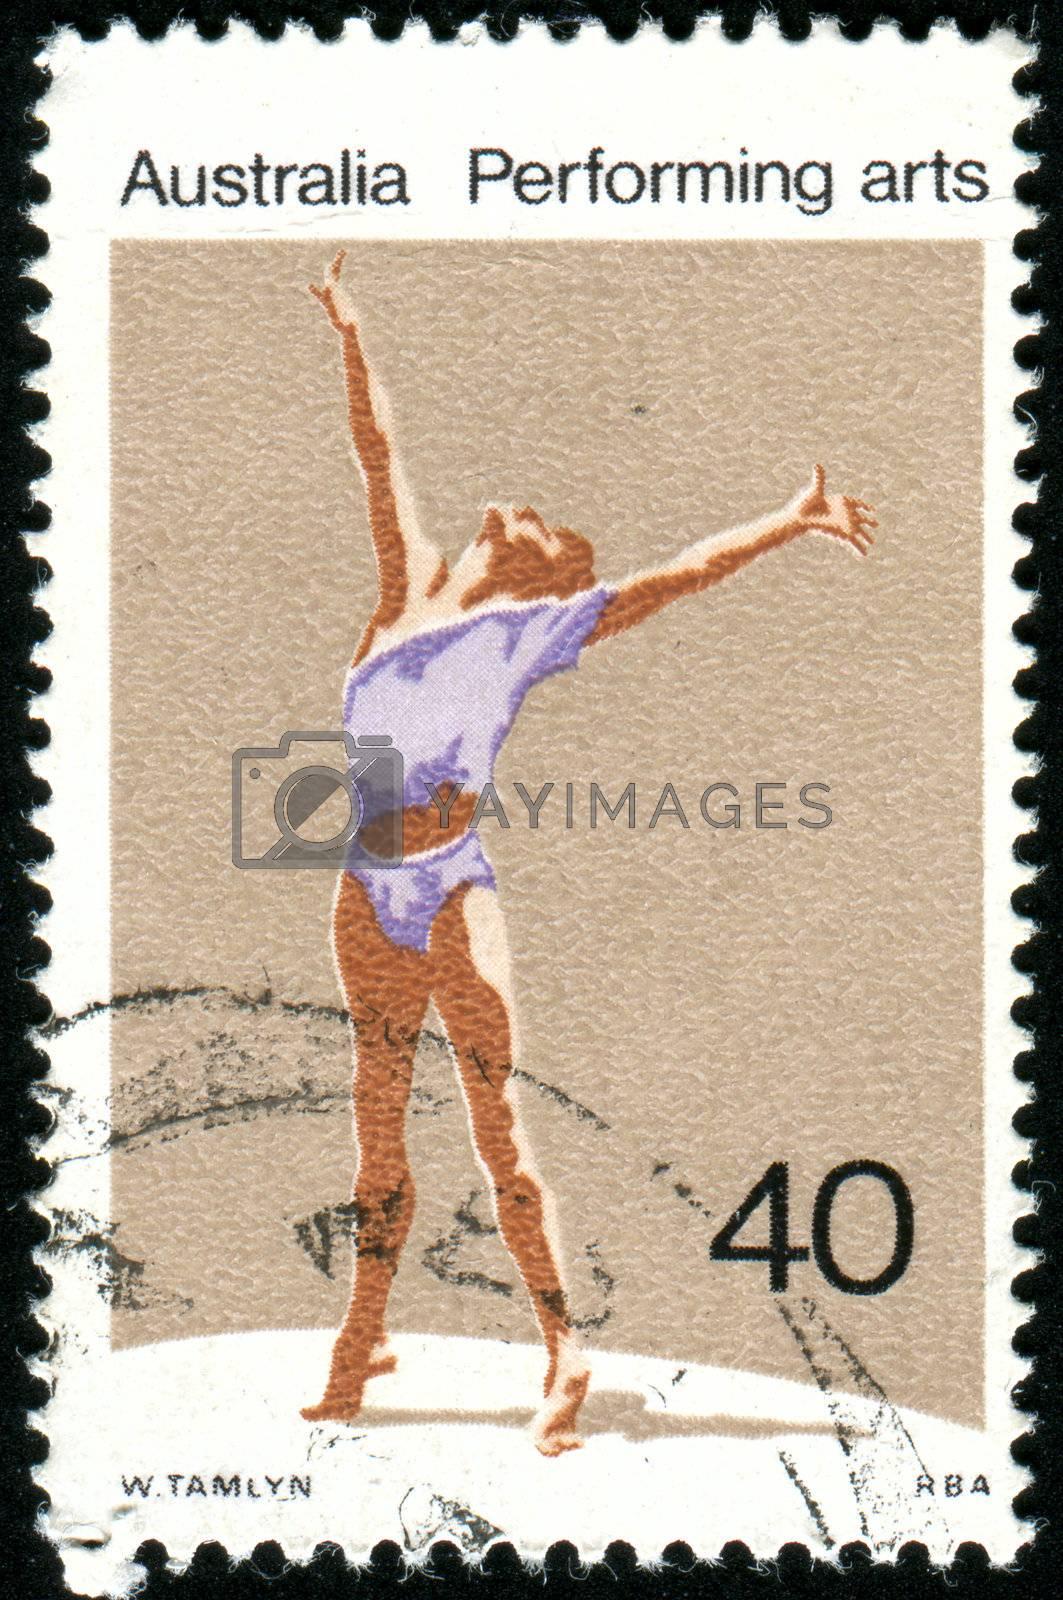 AUSTRALIA - CIRCA 1976: stamp printed by Australia, shows gymnast, circa 1976